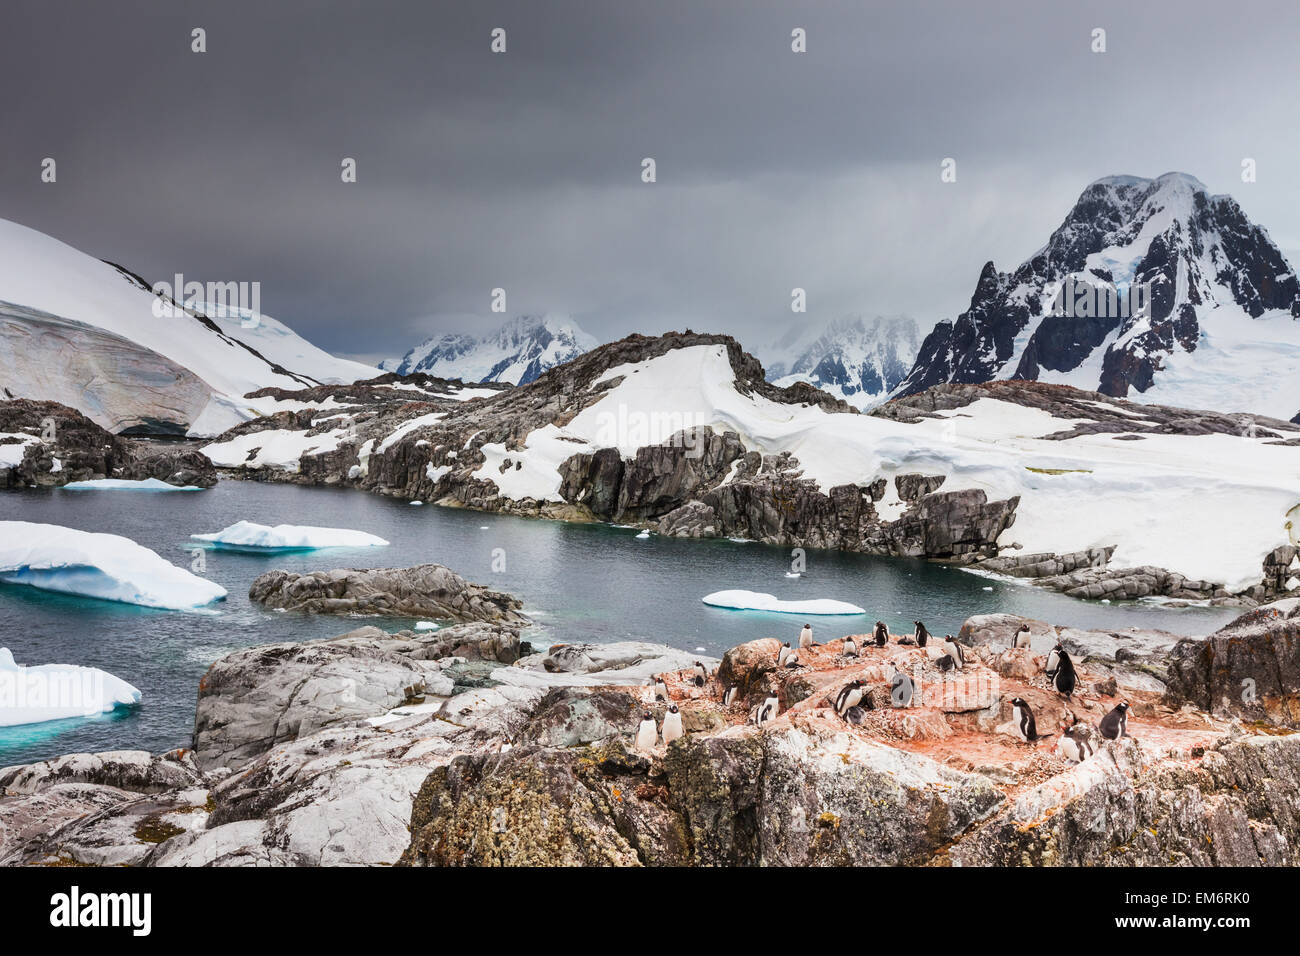 Gentoo penguins (Pygoscelis papua) and icebergs off the shore of Peterman Island; Antarctica Stock Photo